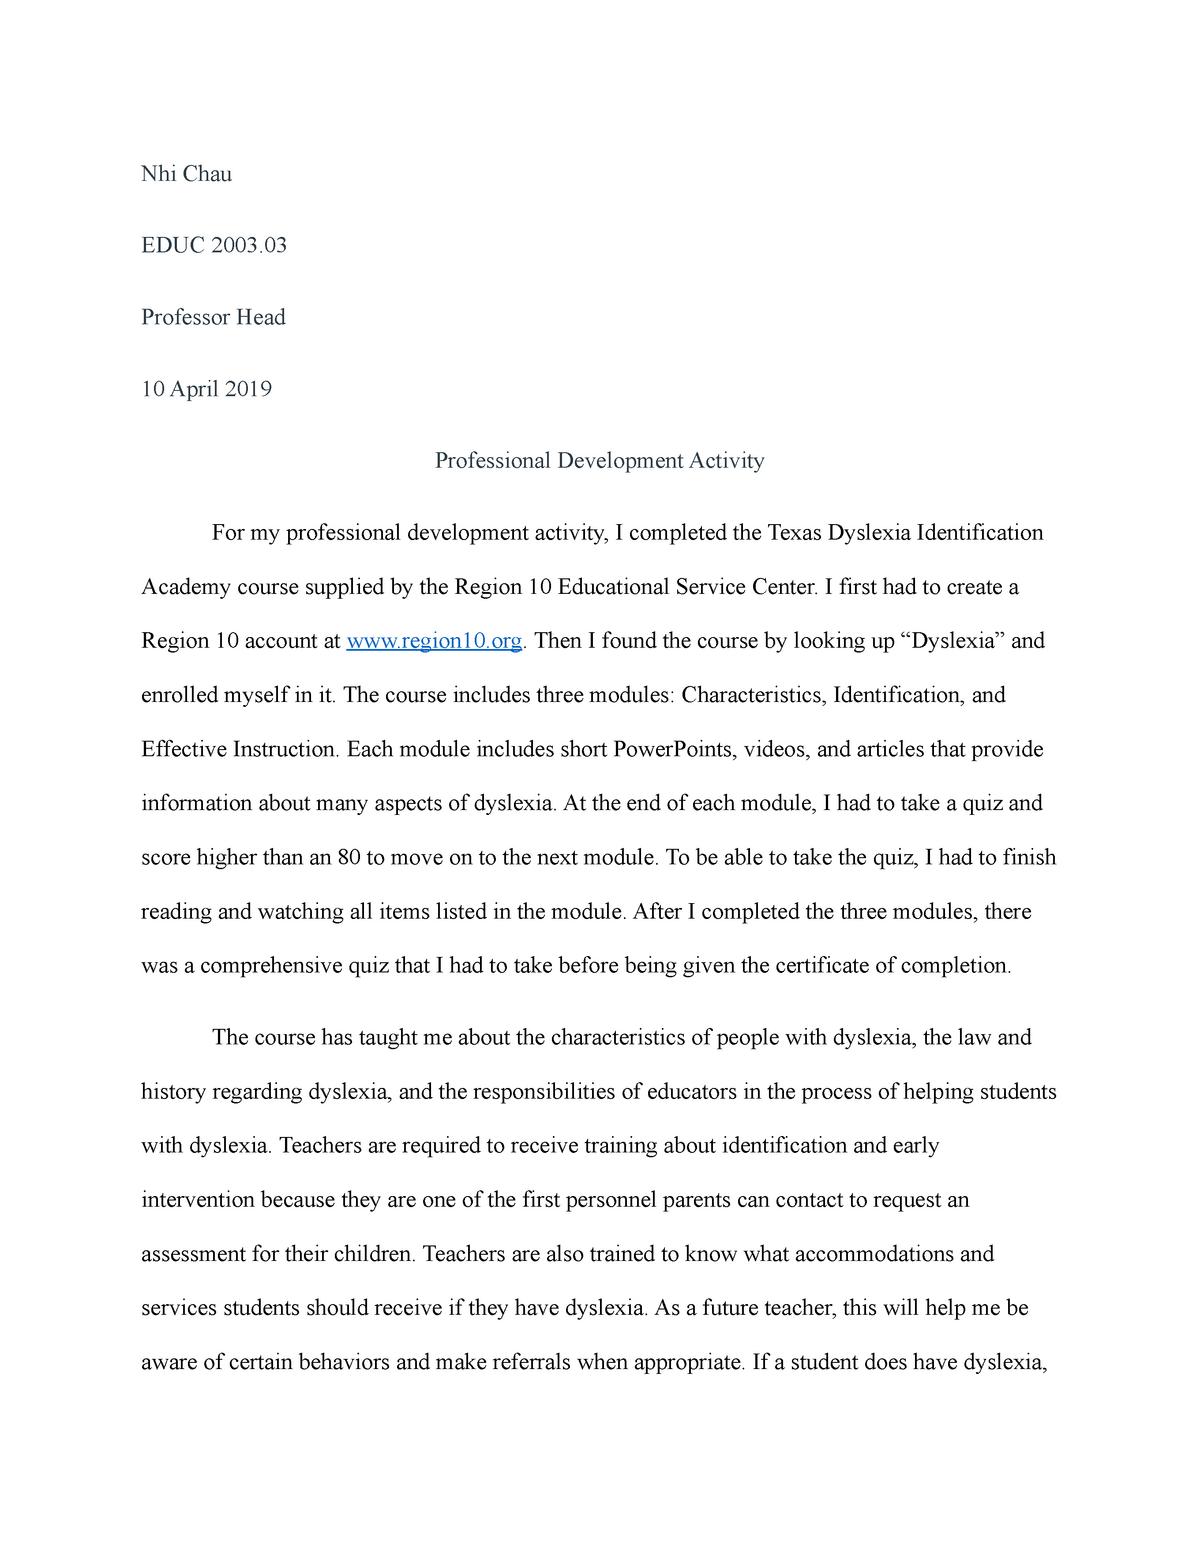 Professional Development Activity - EDUC 2003: Schools and Society